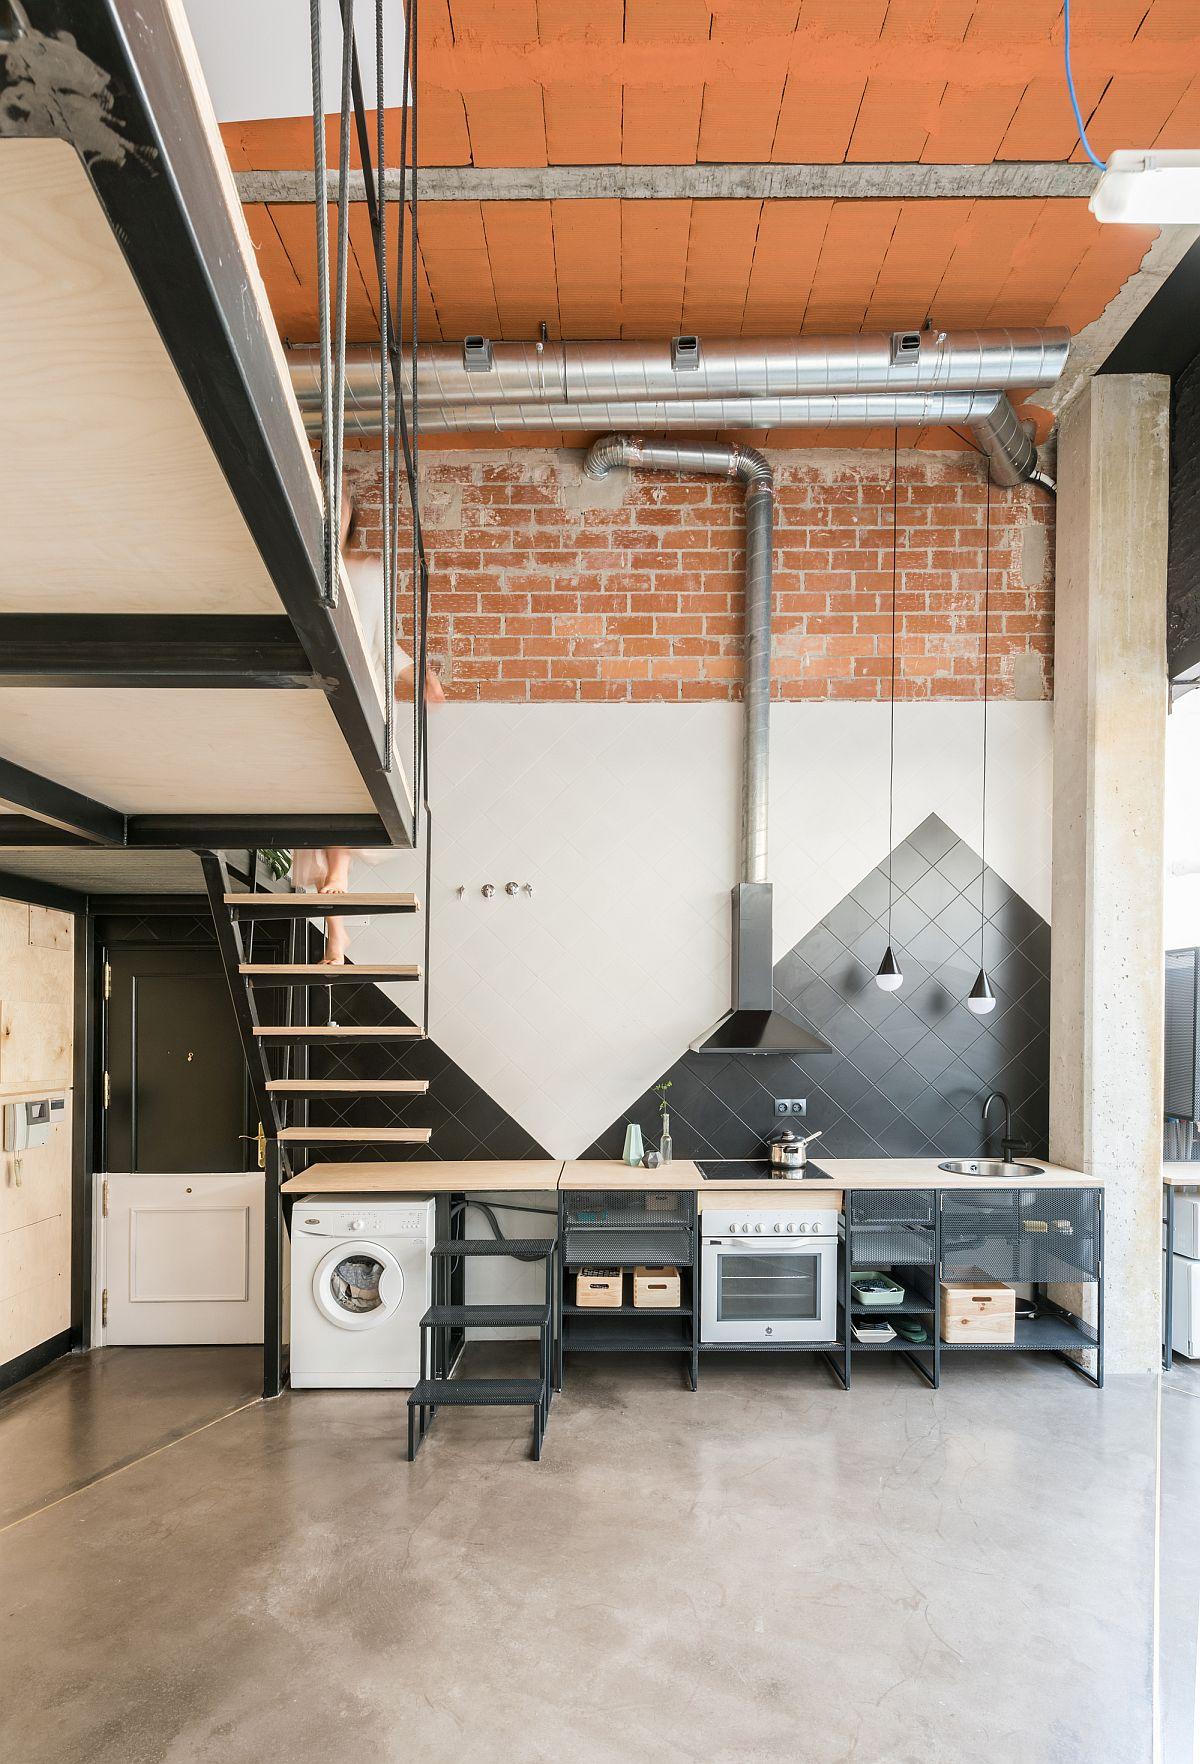 Polished black and white single-wall kitchen idea inside the ground level Madrid apartment